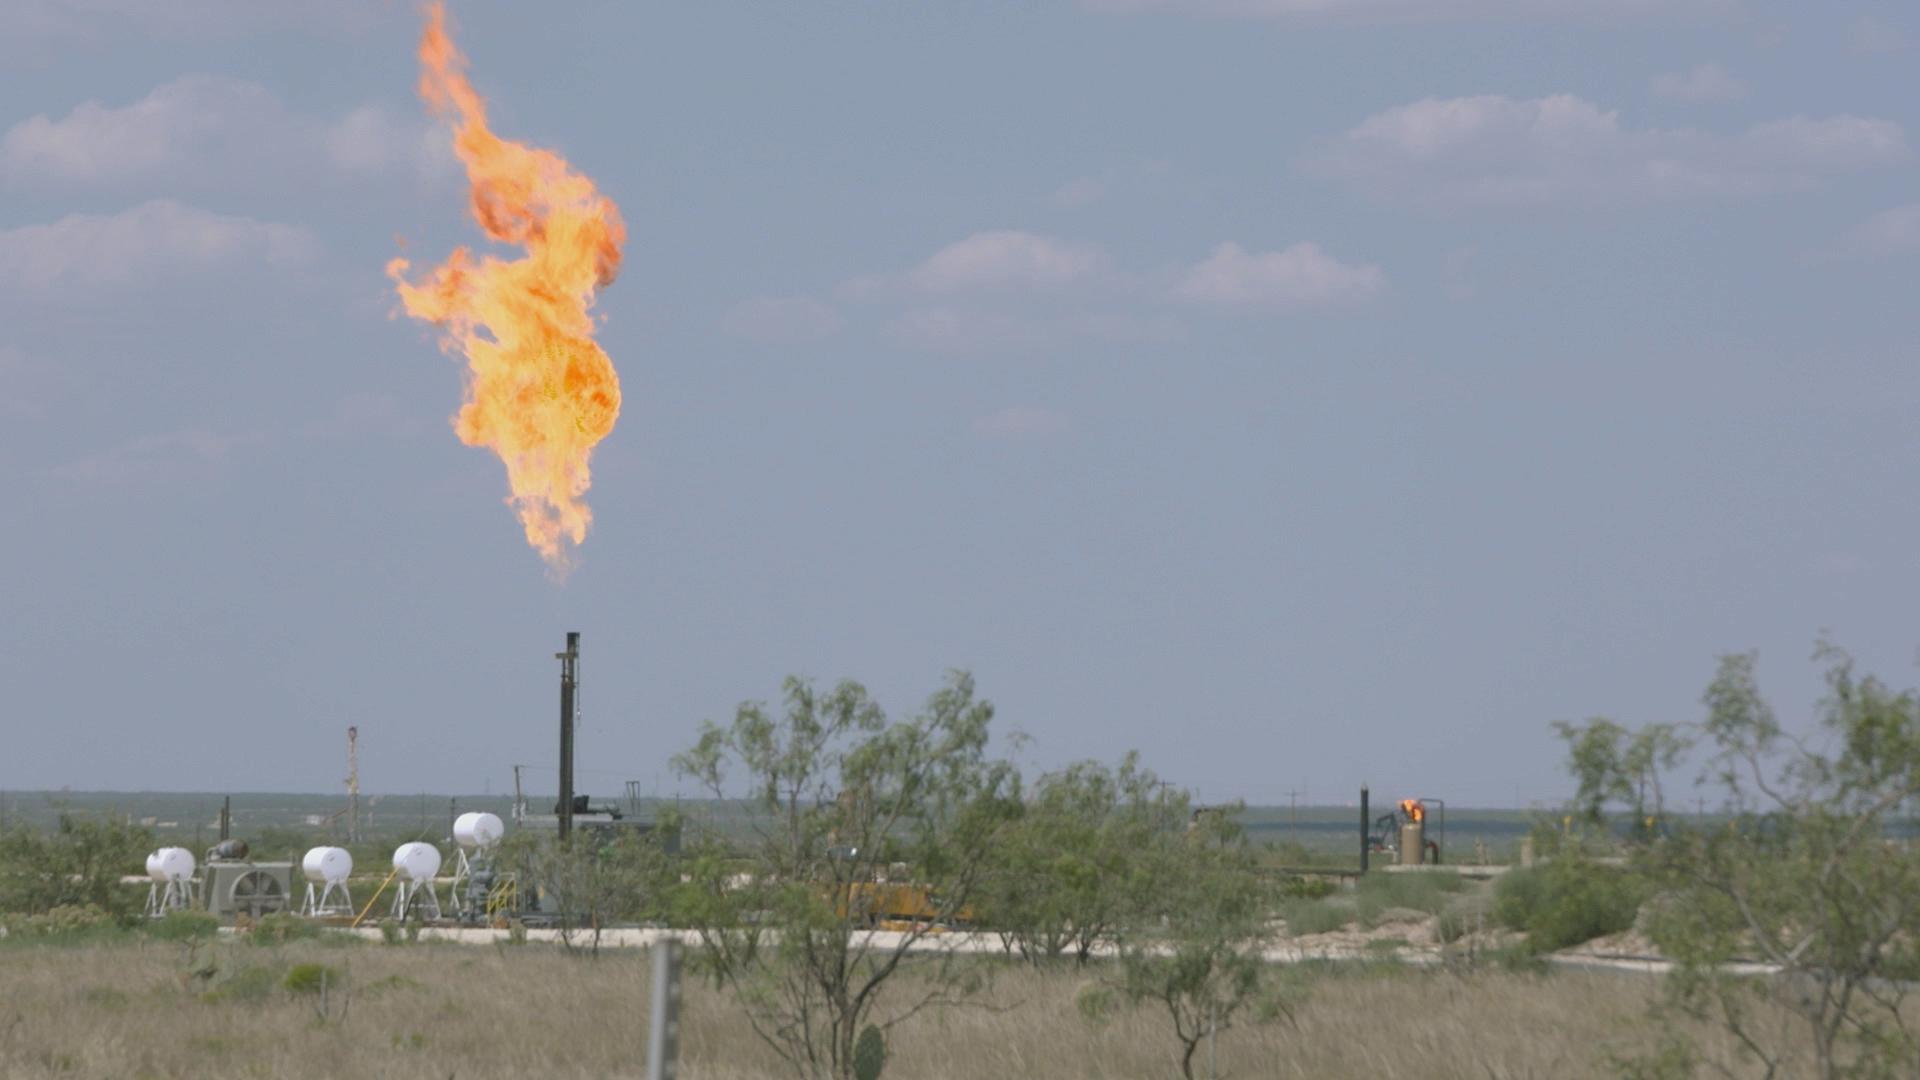 Documentos TV - El póker del petróleo - Avance